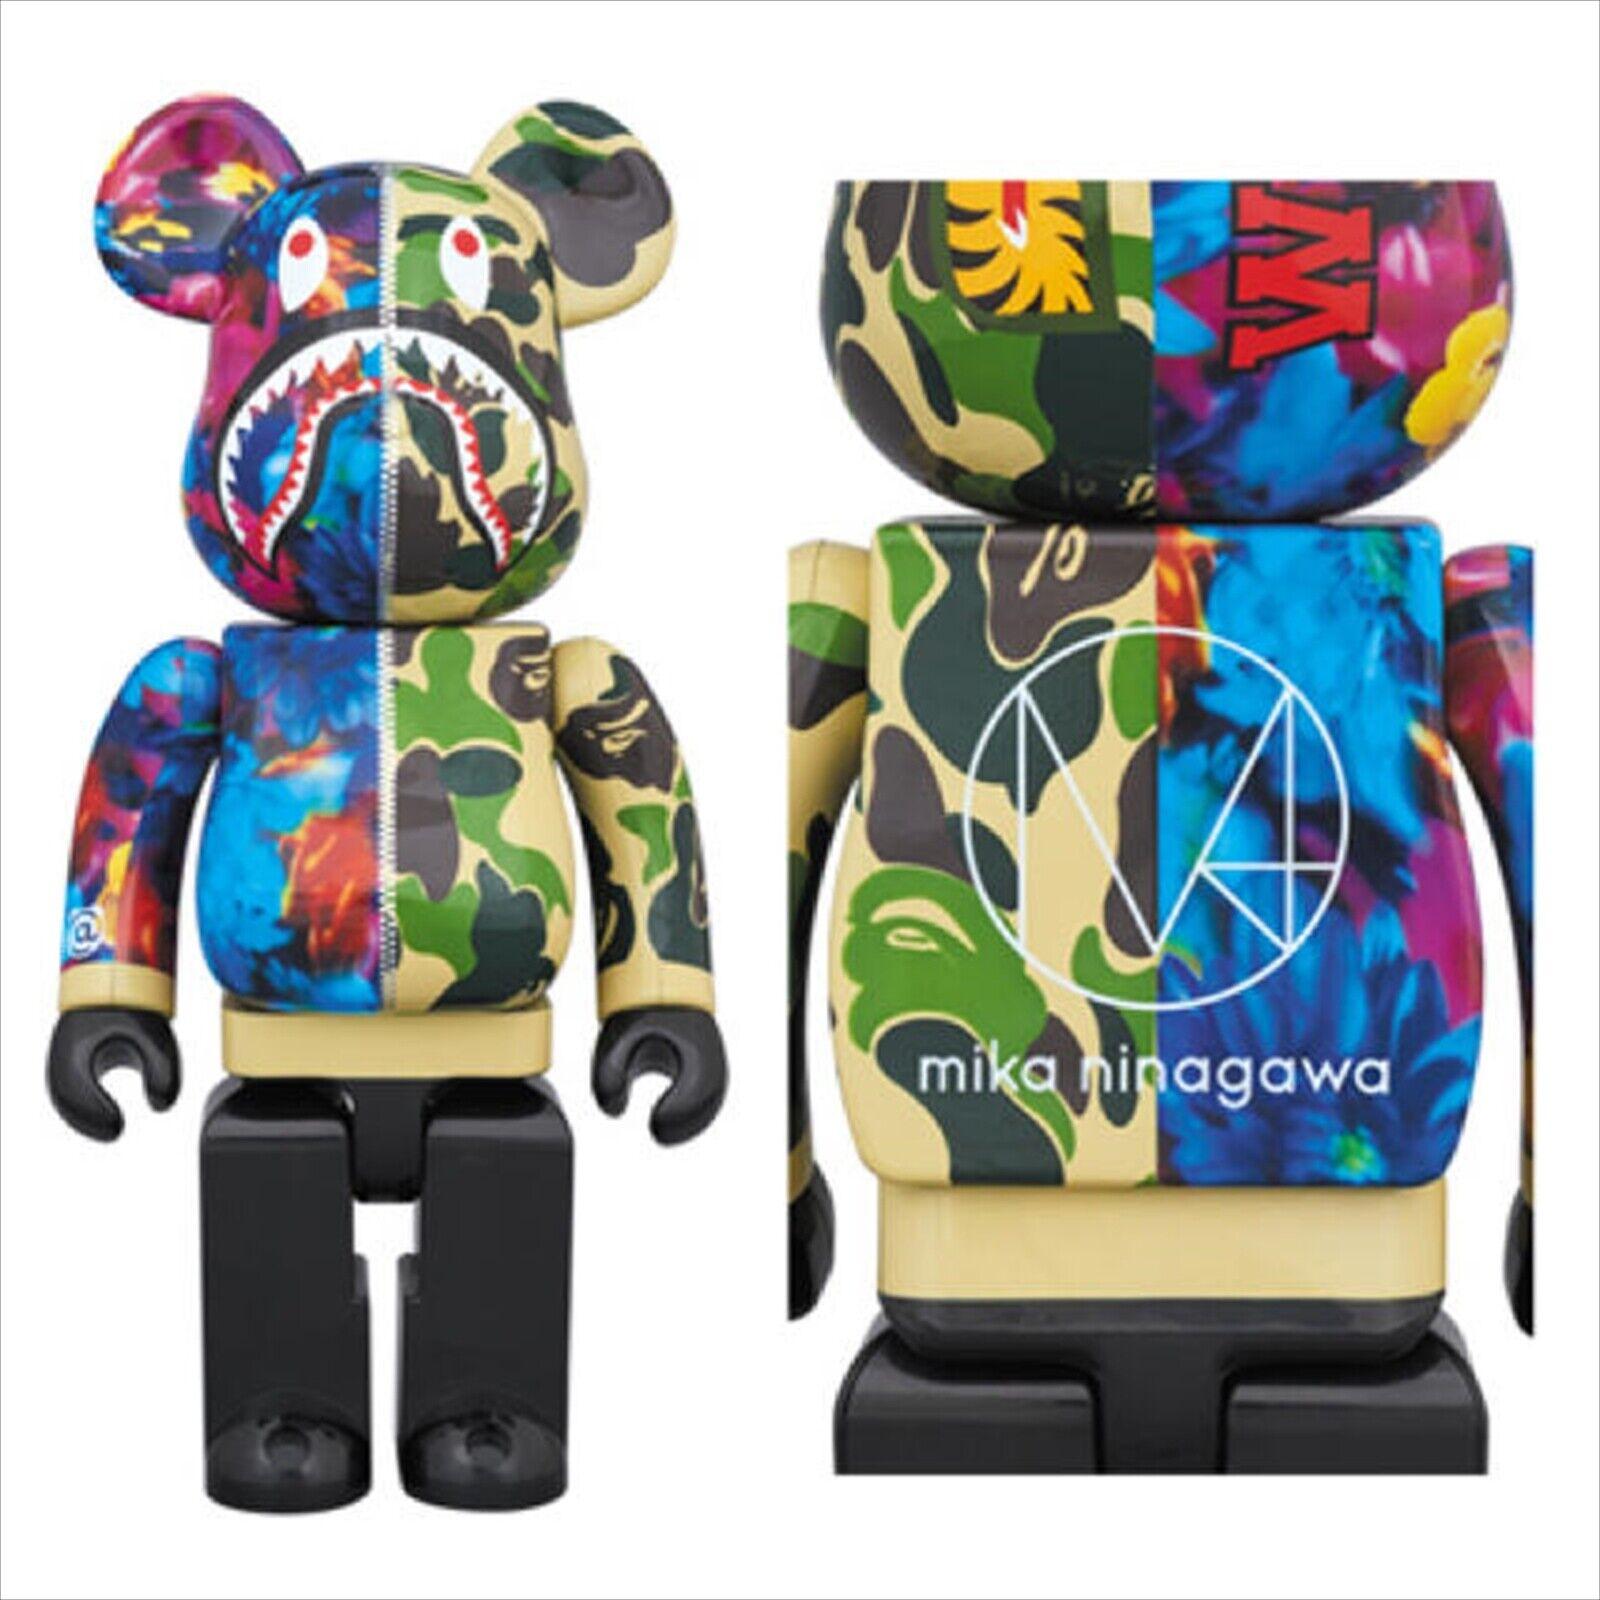 BE@RBRICK 400% 400% & 100% mika ninagawa SHARK Green Medicom Toy Figure